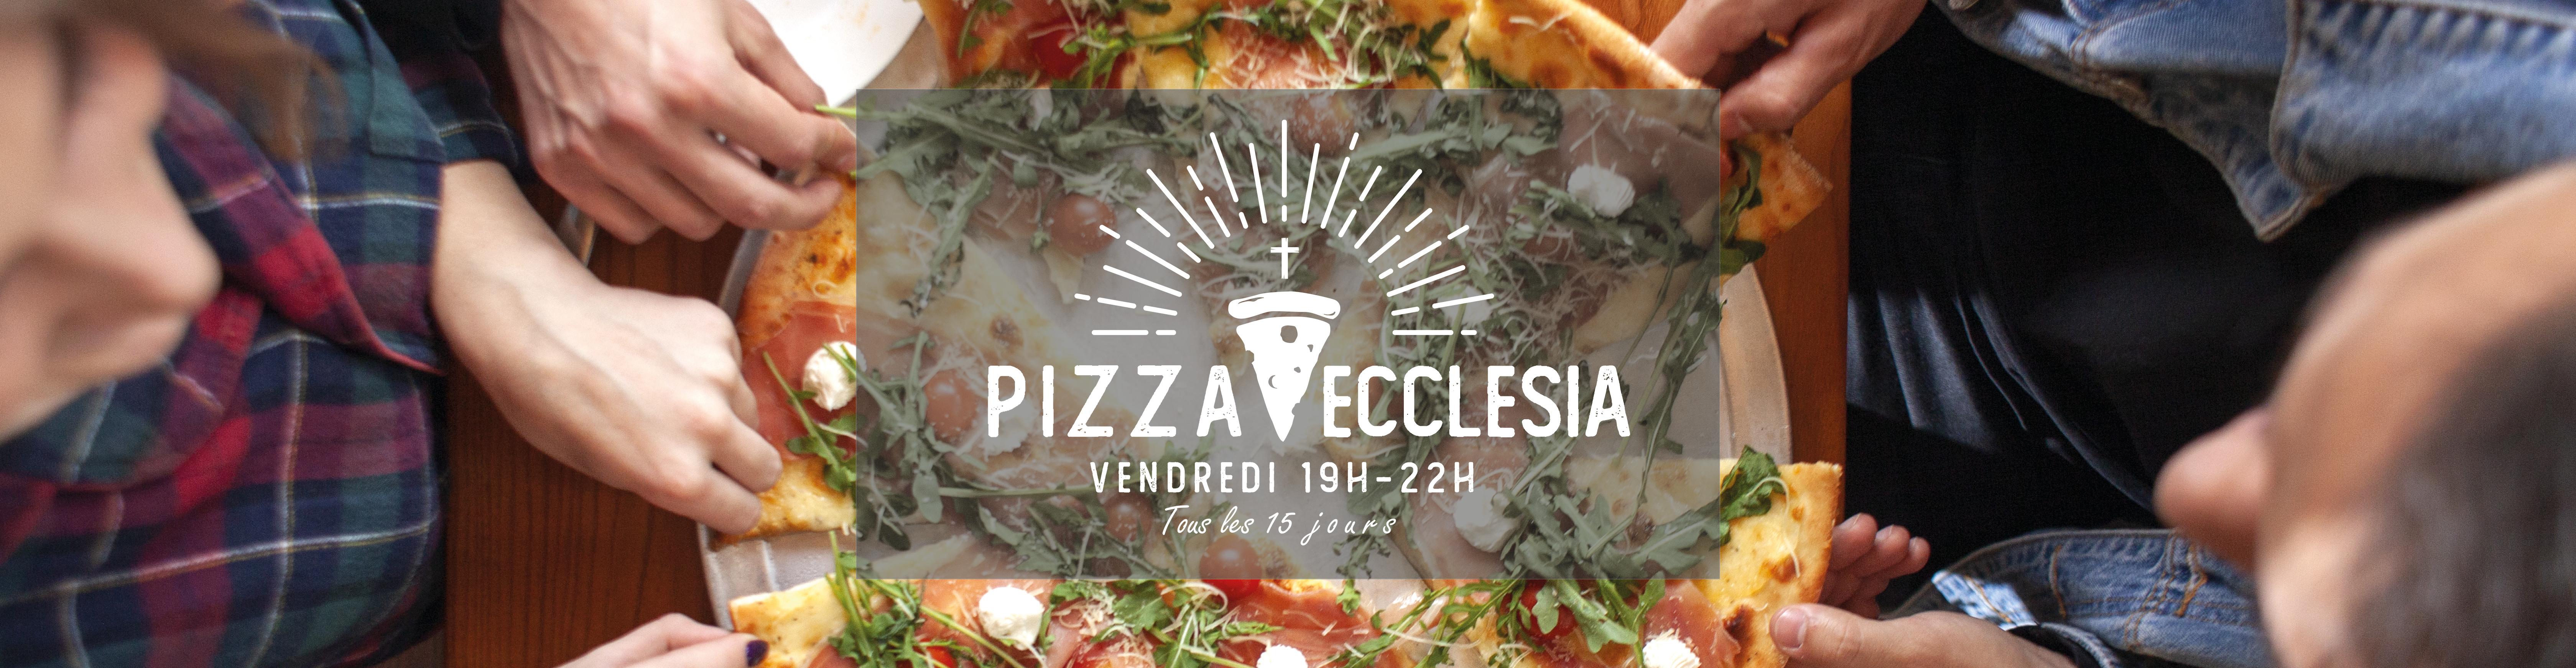 Header-pizza-ecclesia-1